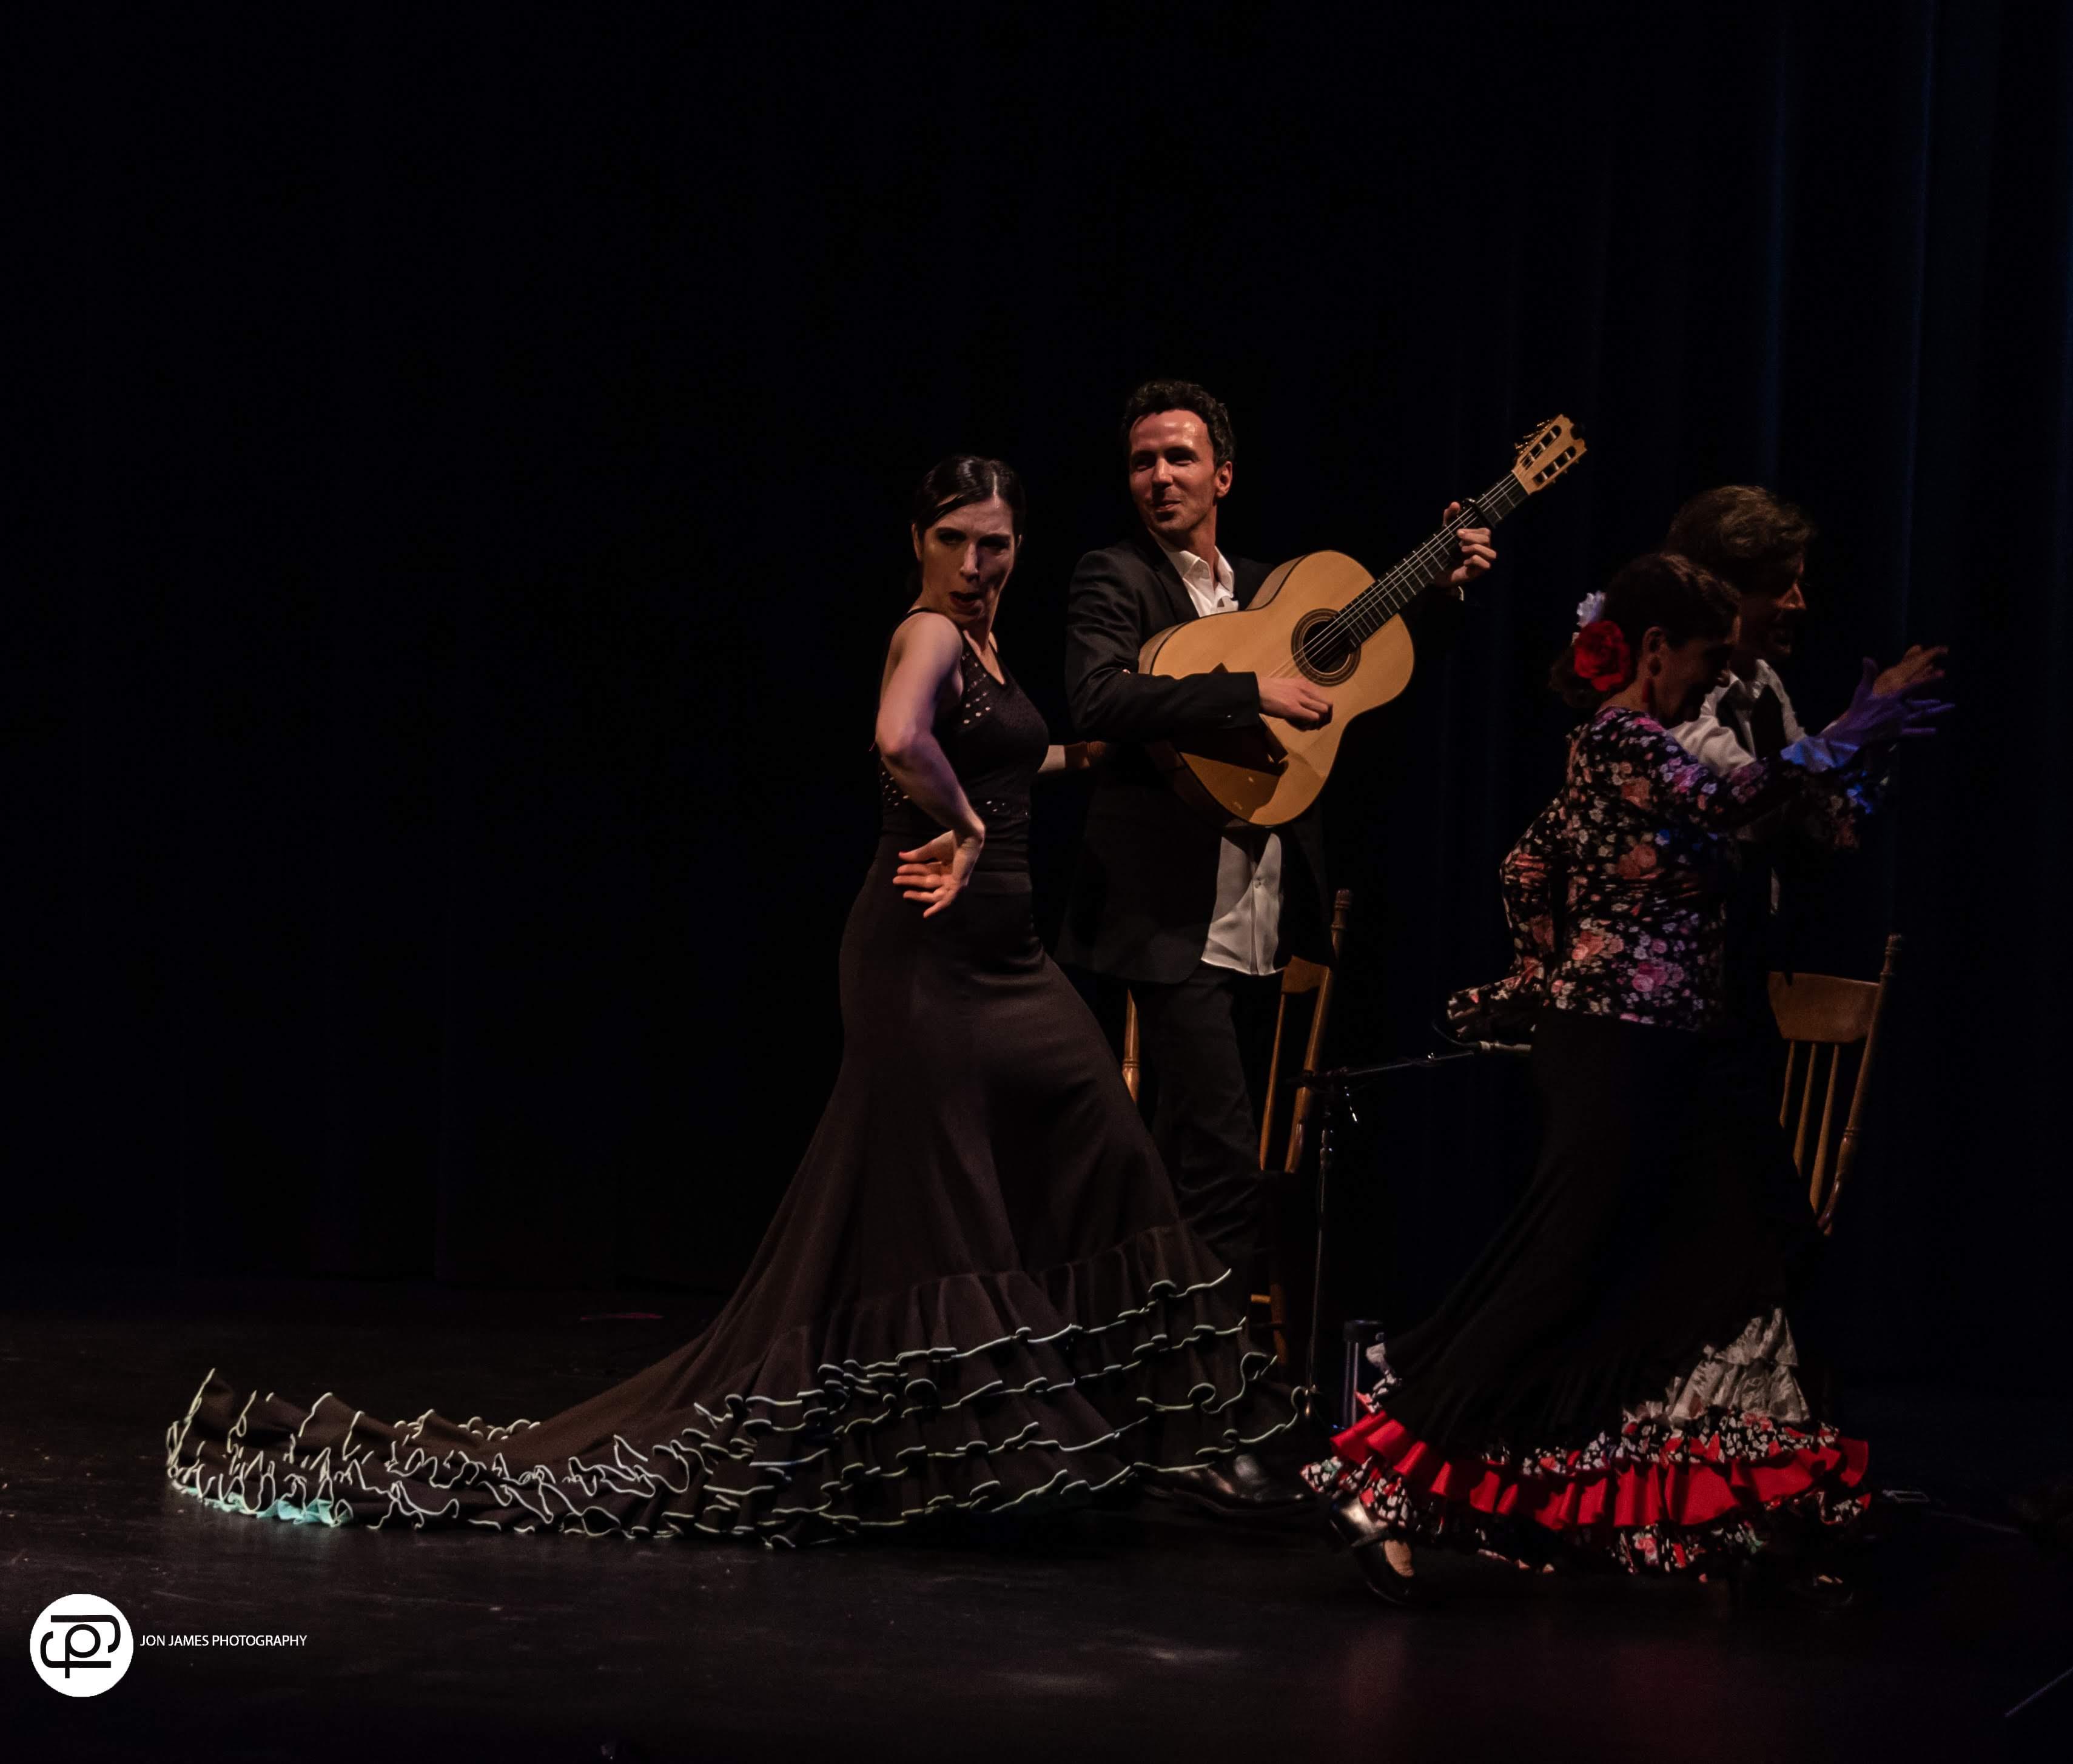 dan macneil and maria osende walk playfully offstage while dan plays flamenco guitar